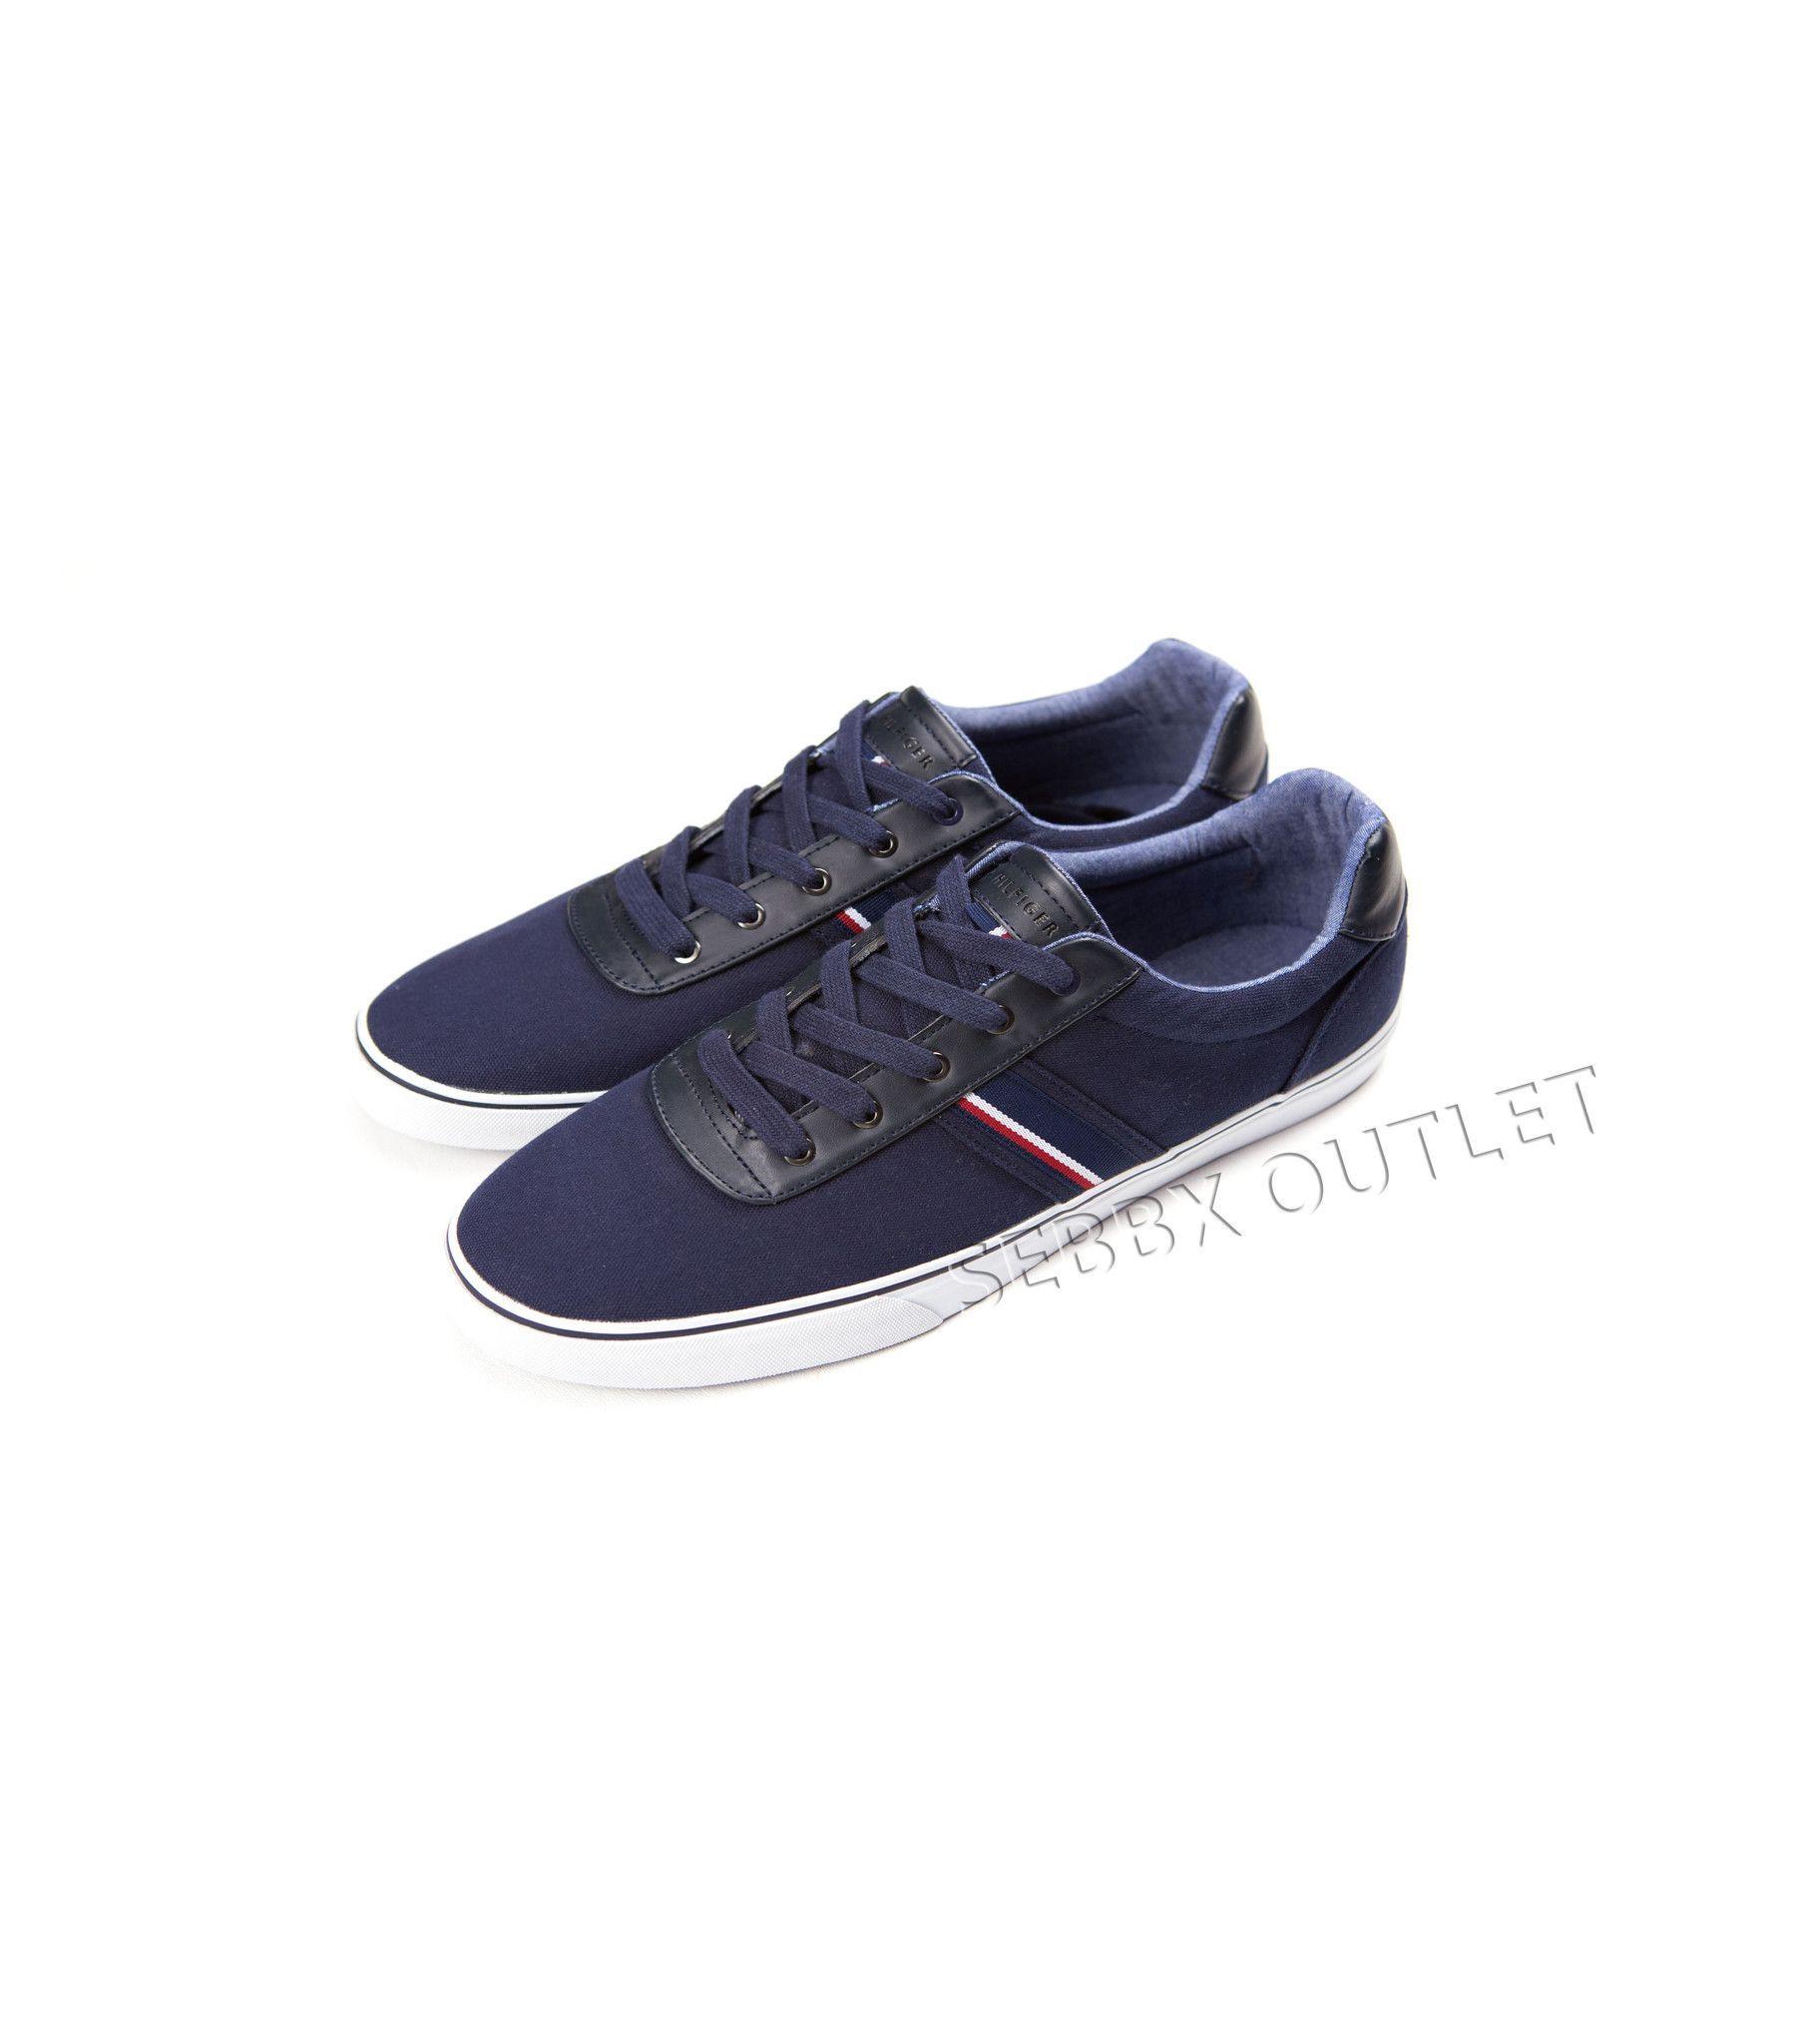 ebab92d01 Tommy Hilfiger Sneakers Phoenix Dark Blue Lace Up Shoes